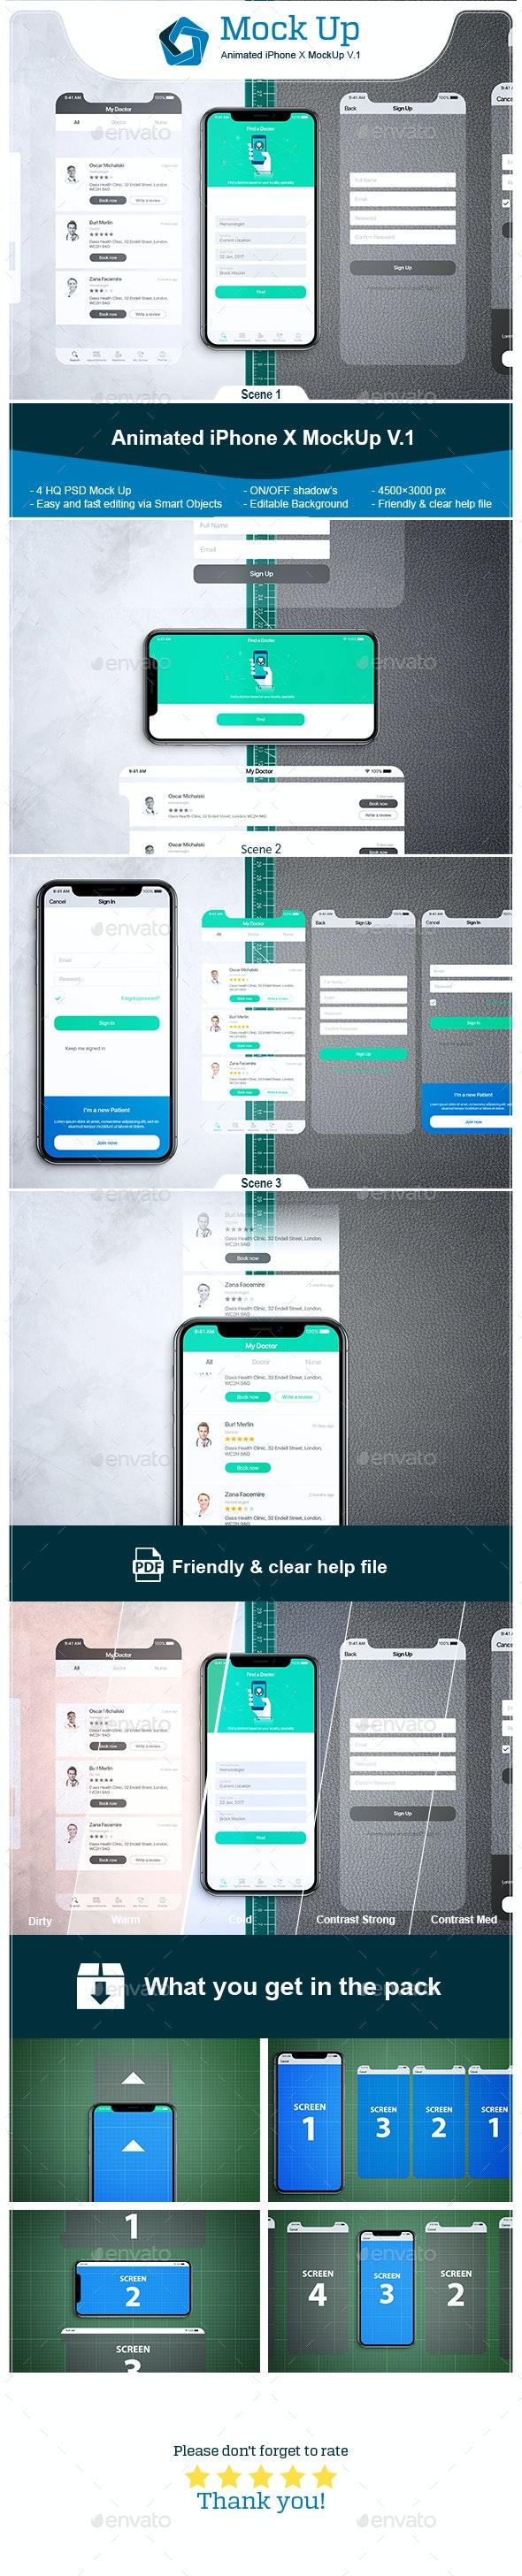 Animated iPhone X MockUp V.1 - Mobile Displays